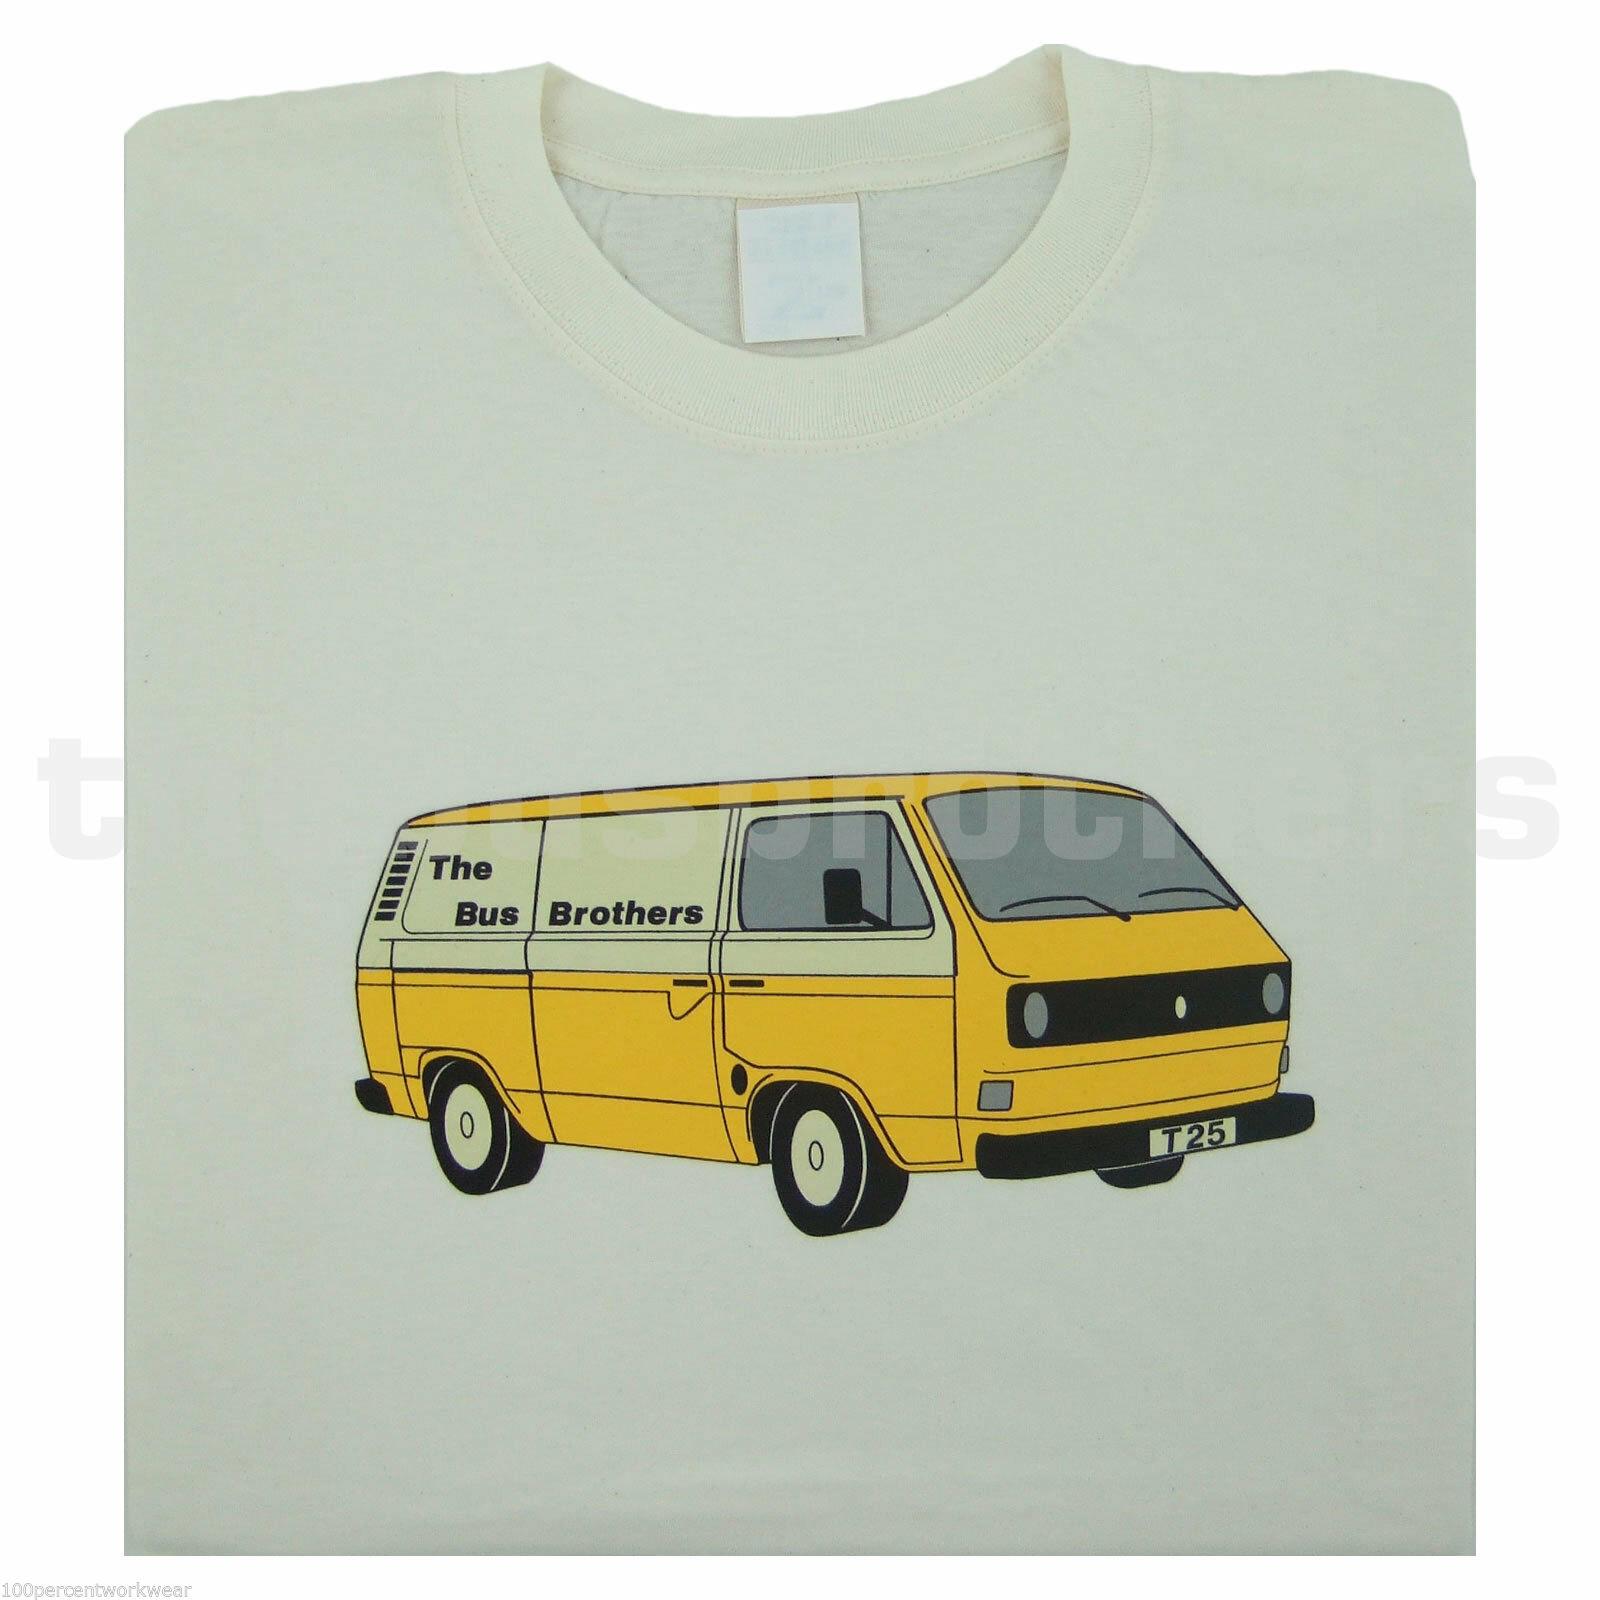 Bus Brothers T25 T3 Panel Van Kastenwagen Transporter Mens T Shirt